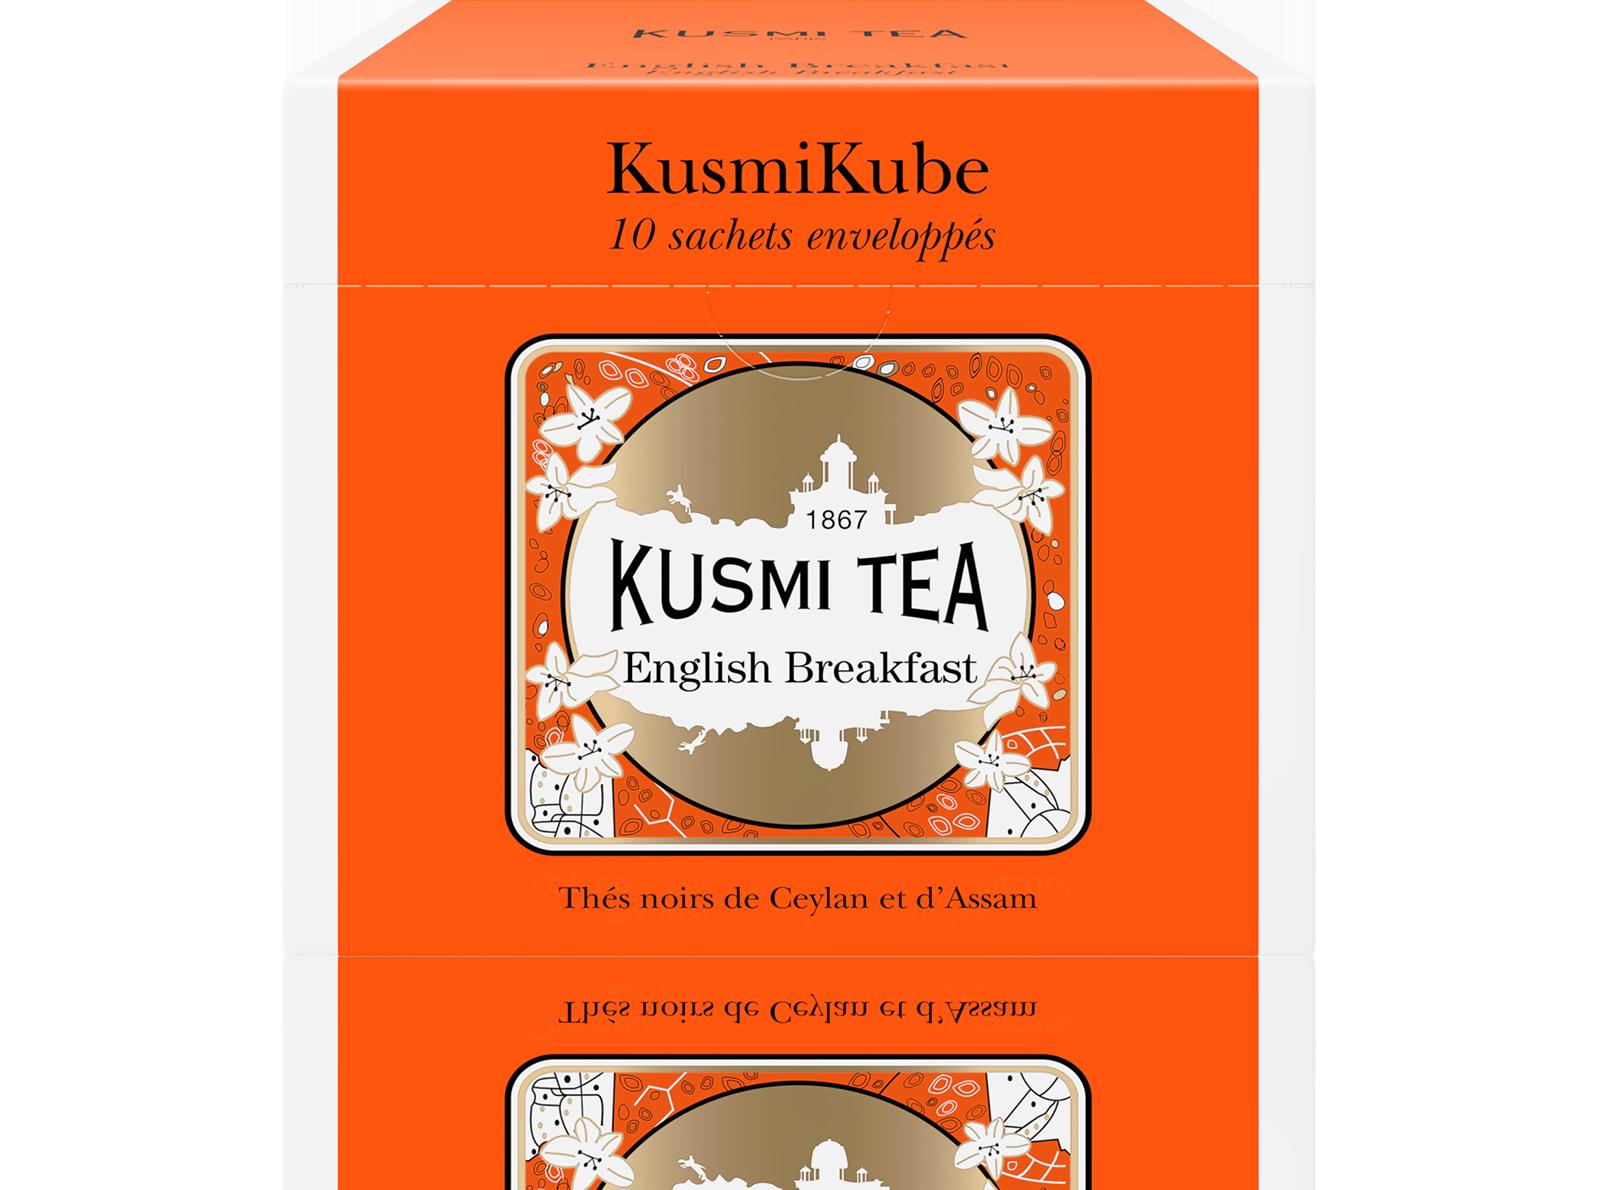 Thé noir sachet - English Breakfast - Kusmi Tea